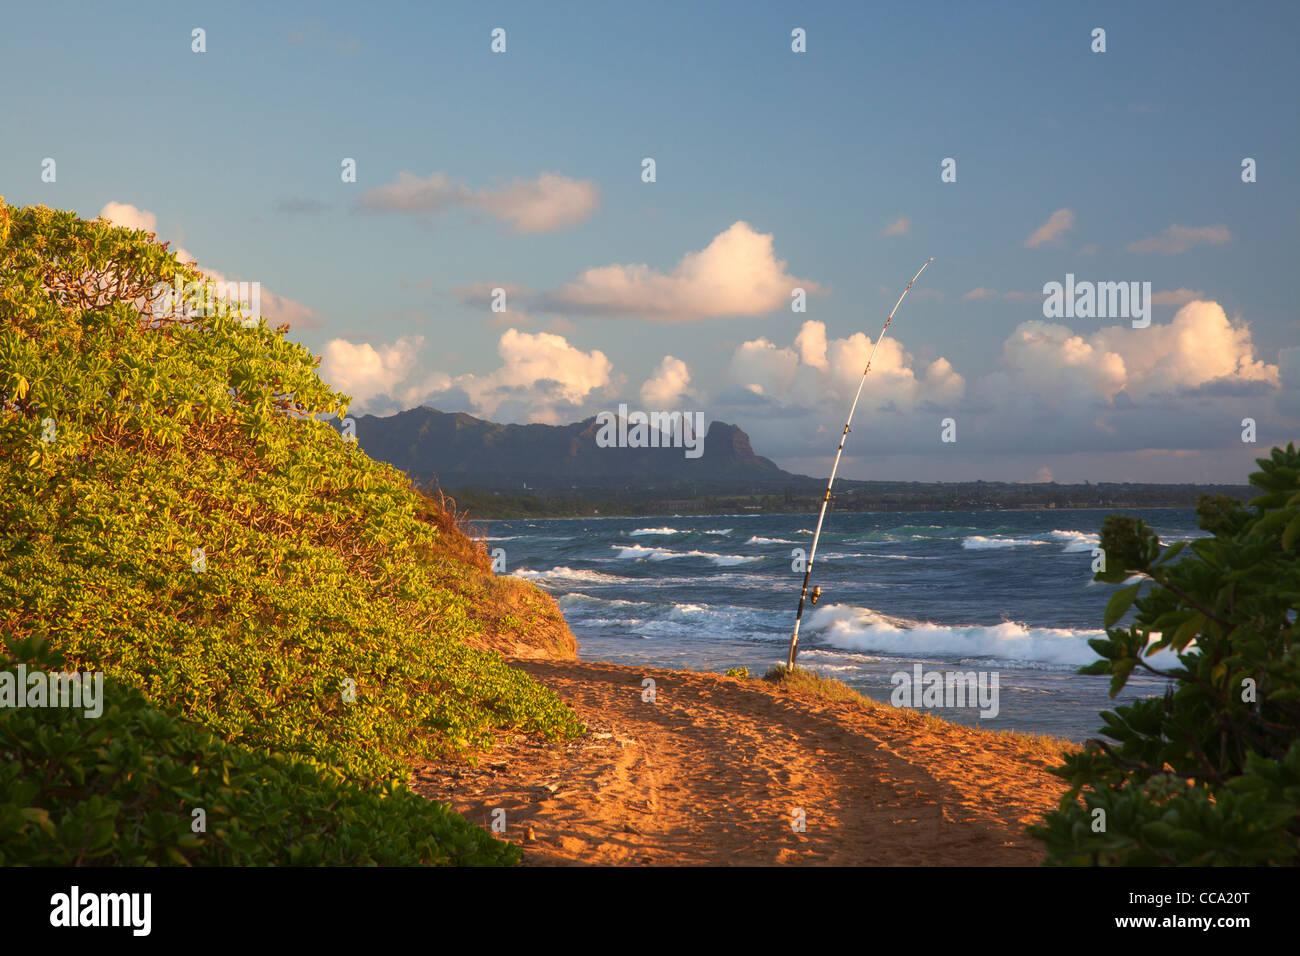 Fishing at Nukoli'i Beach, also known as Kitchens Beach, Kauai, Hawaii. - Stock Image